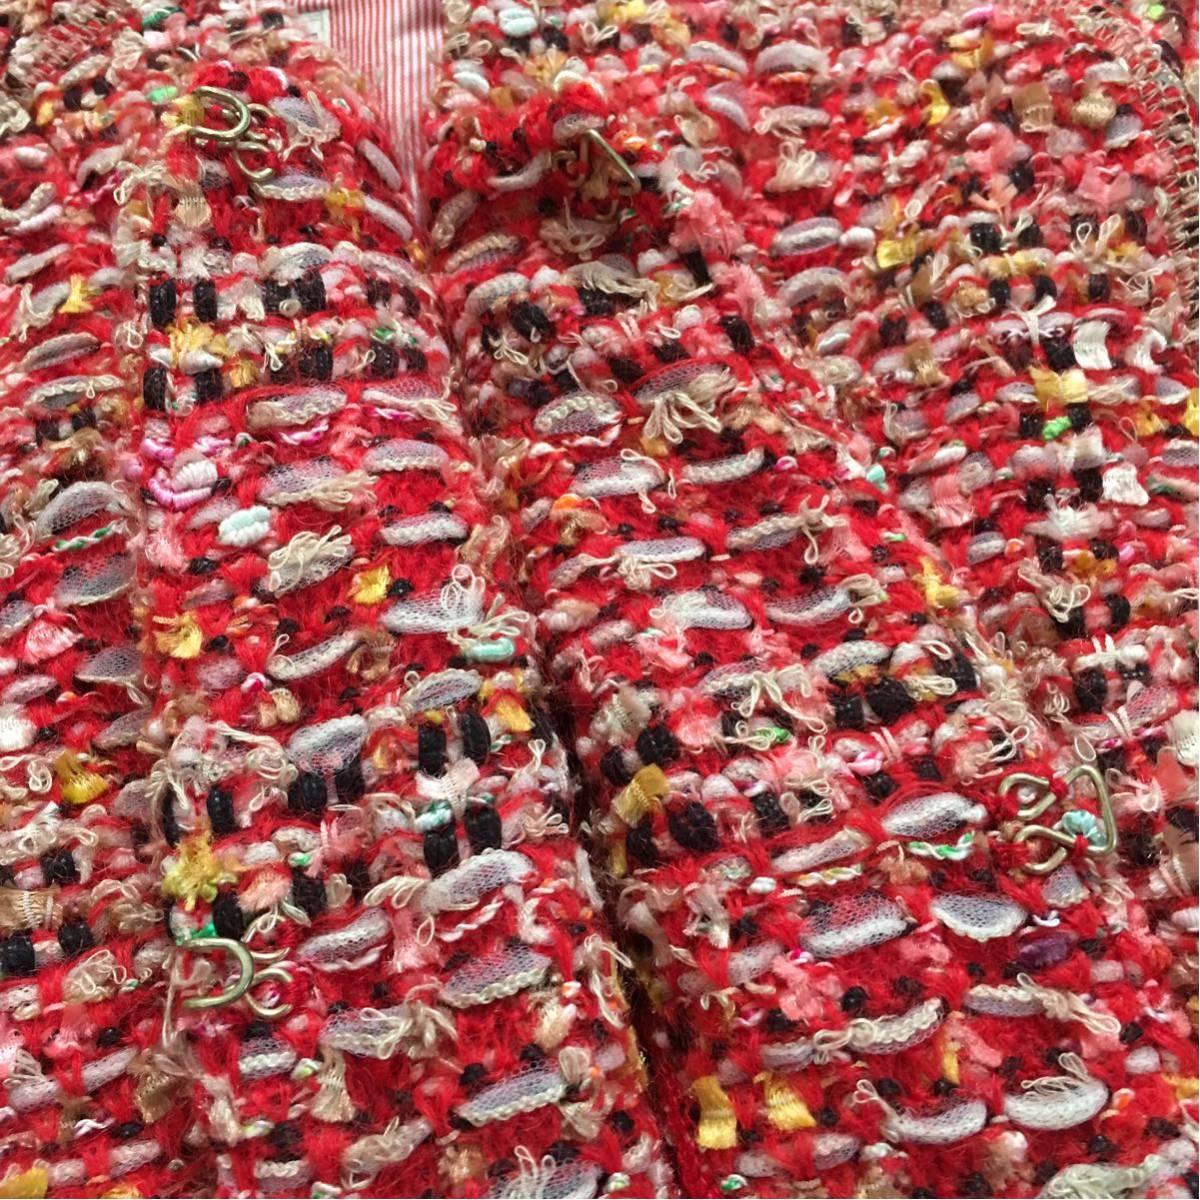 k 美品 Coohem(コーヘン) 個性的なツイードコート 赤系 36サイズ 可愛いジャケットコート_画像5